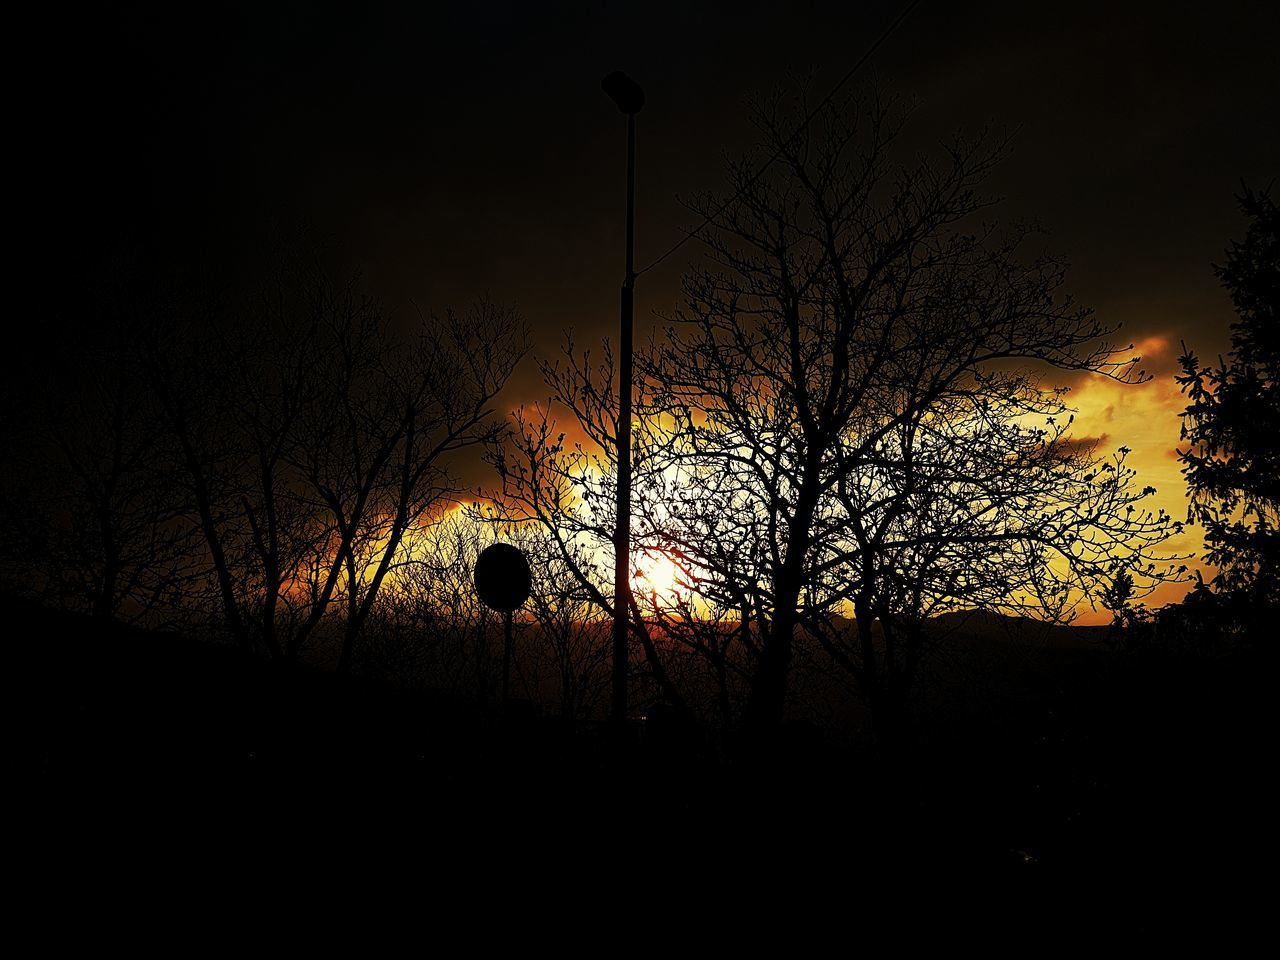 Sunset Sun Orange Contrast Outdoors Tree Nature Sky No People Silhouette Illuminated Day